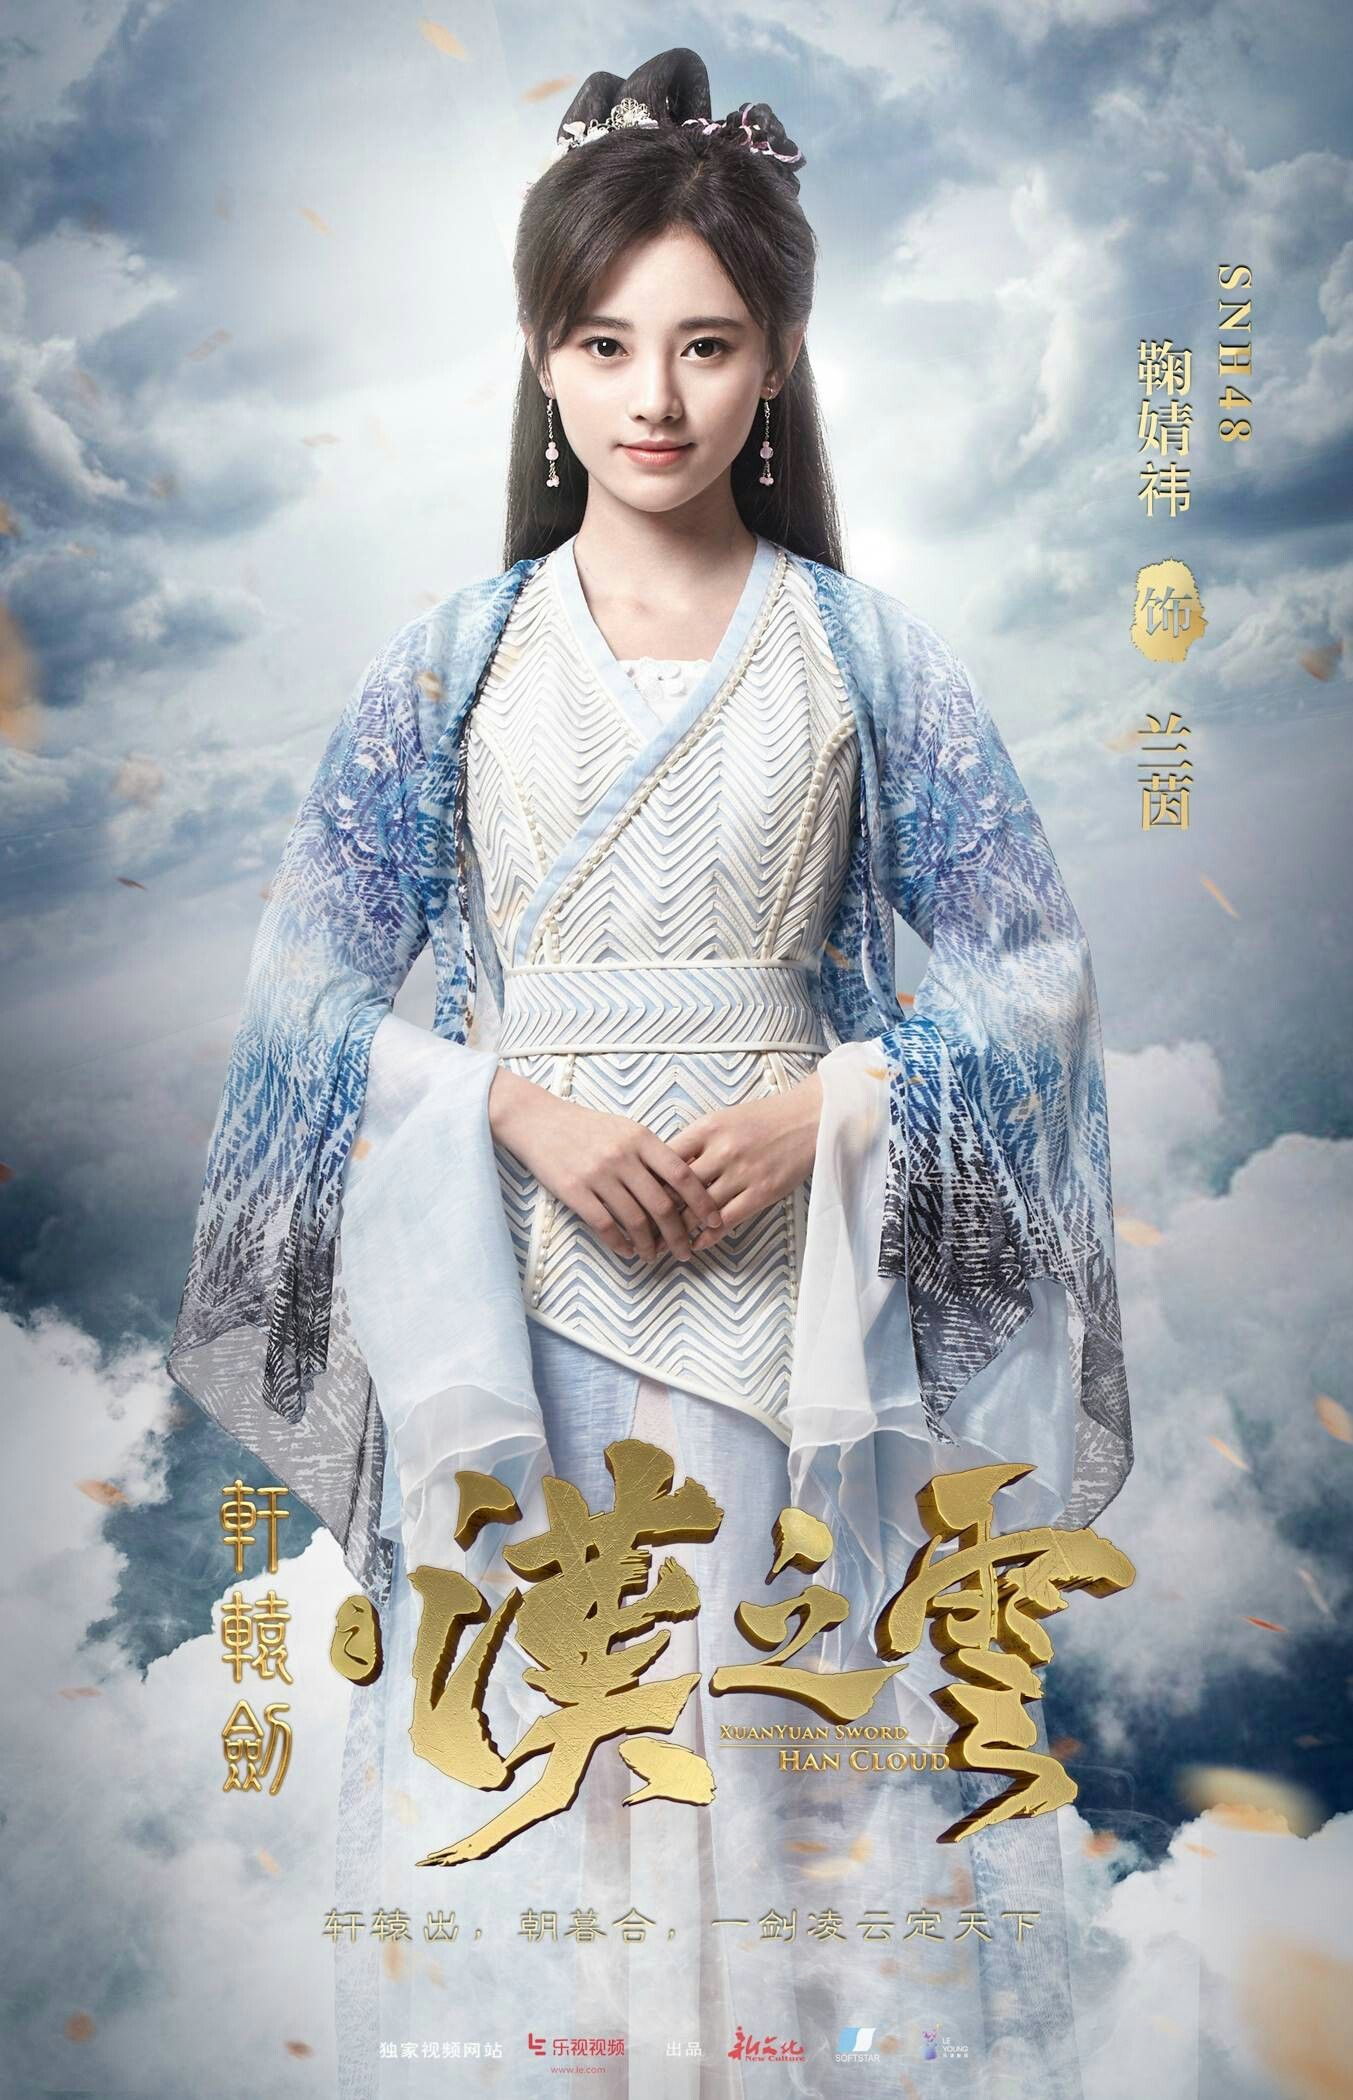 Xuan Yuan Sword Han Clouds 《轩辕剑之汉之云》